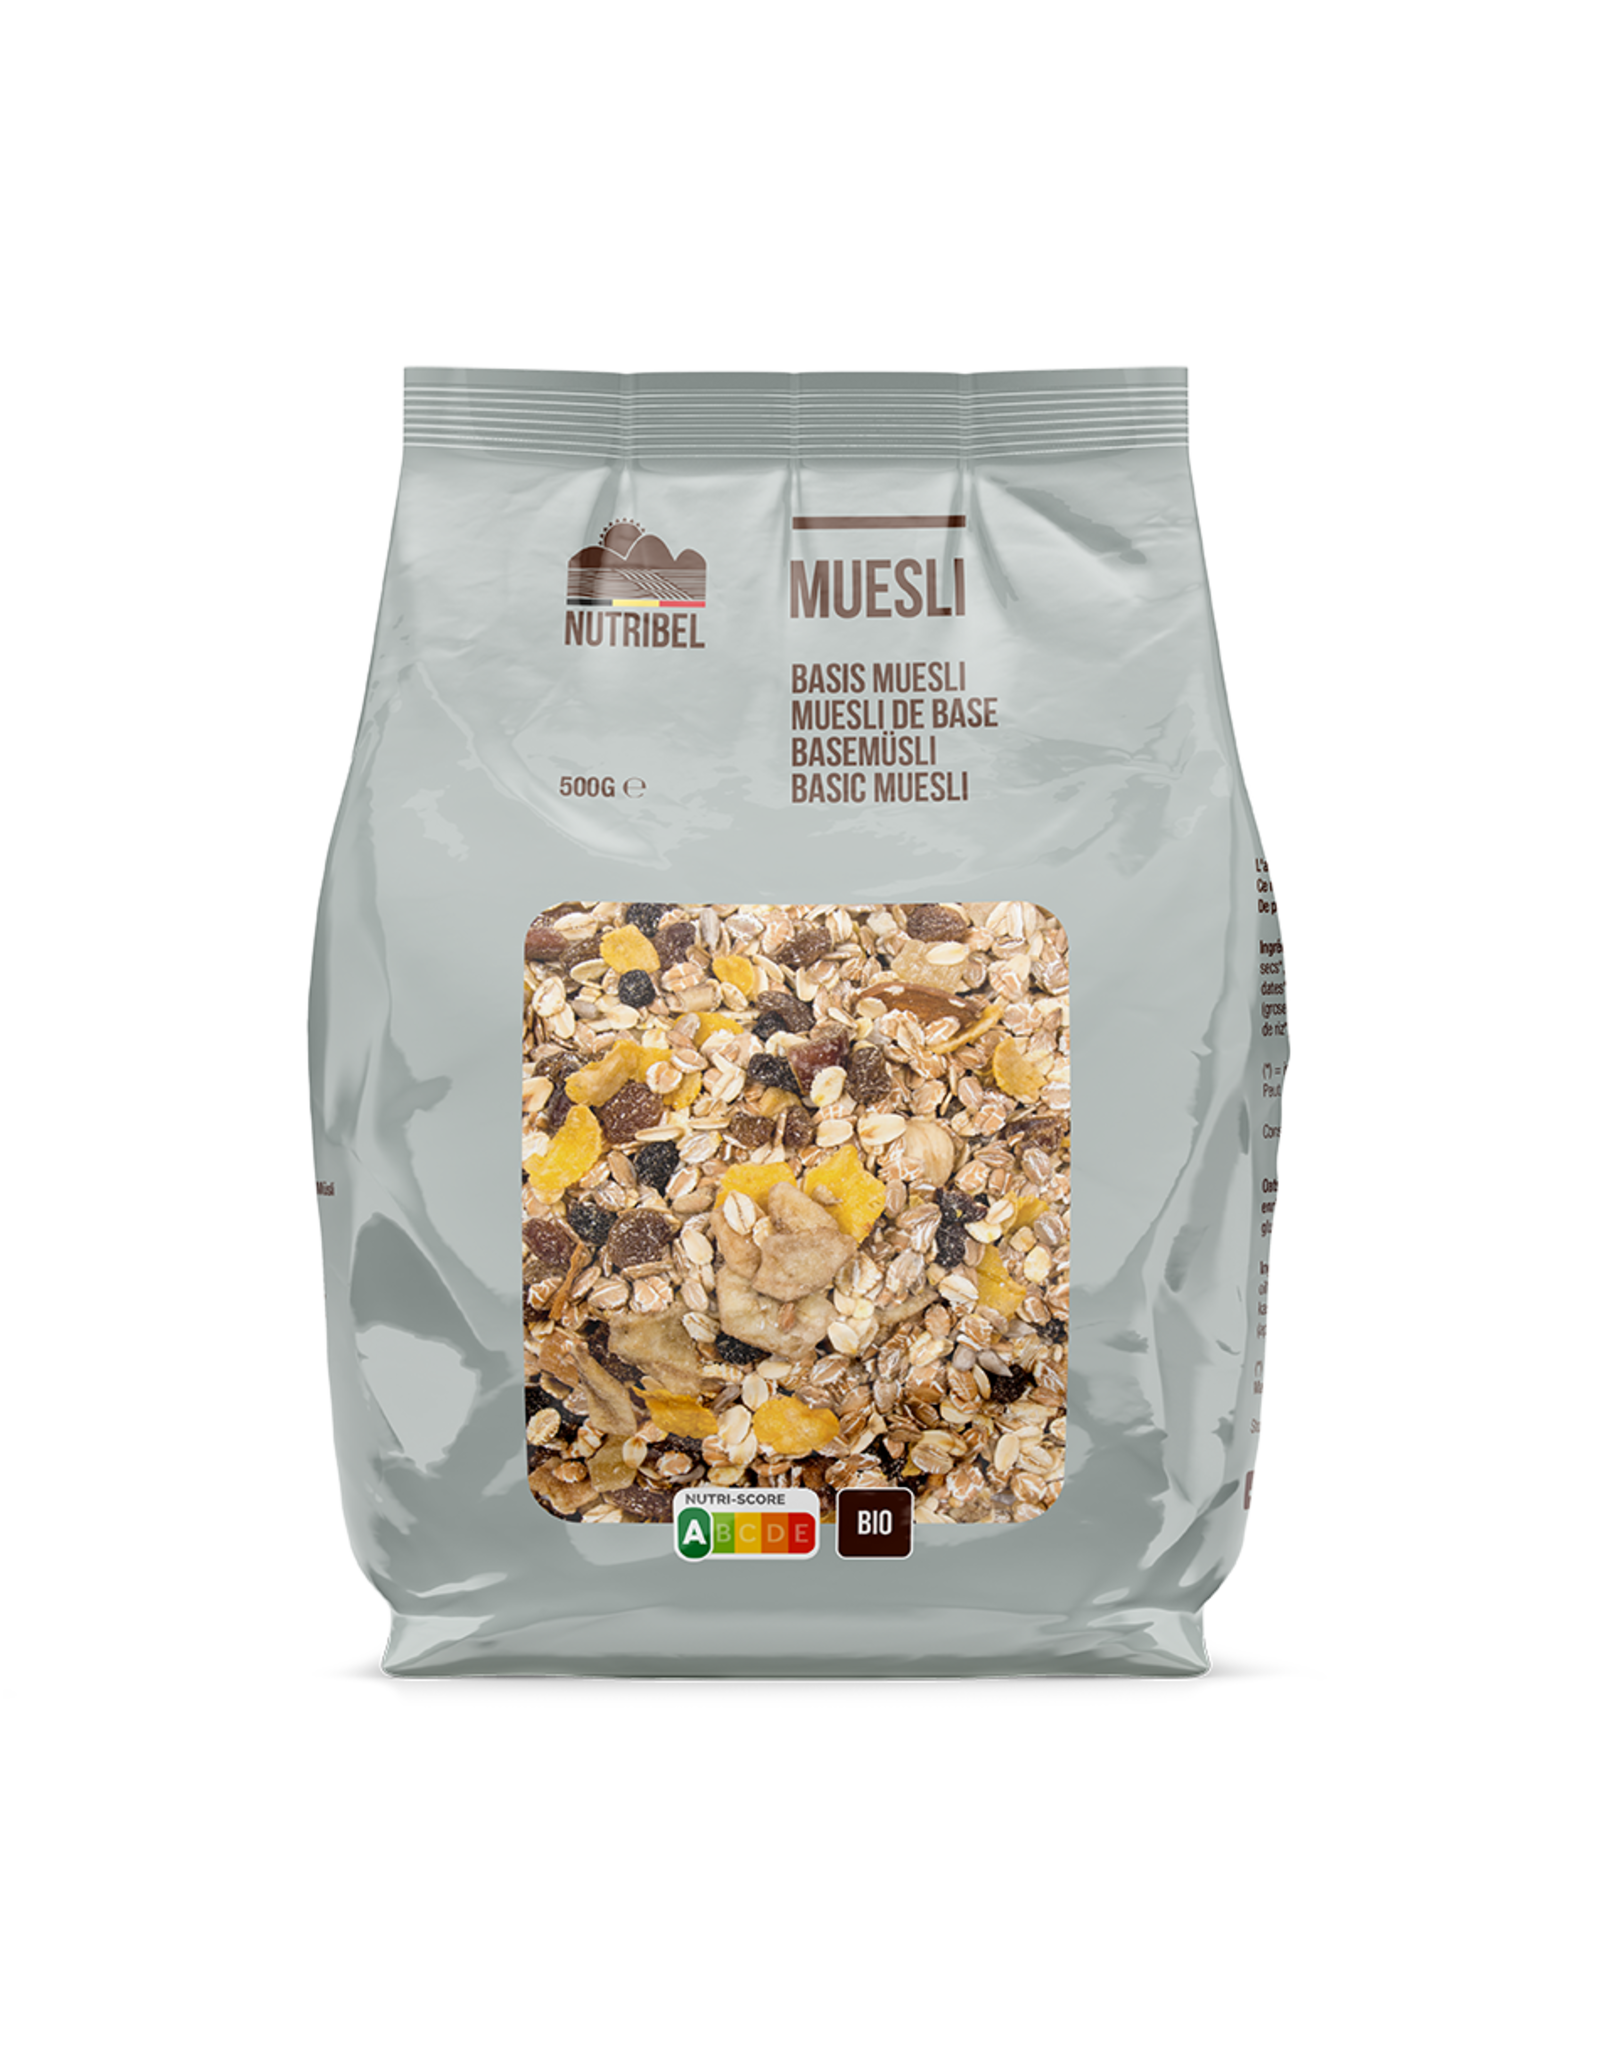 Nutribel Muesli base bio 500g